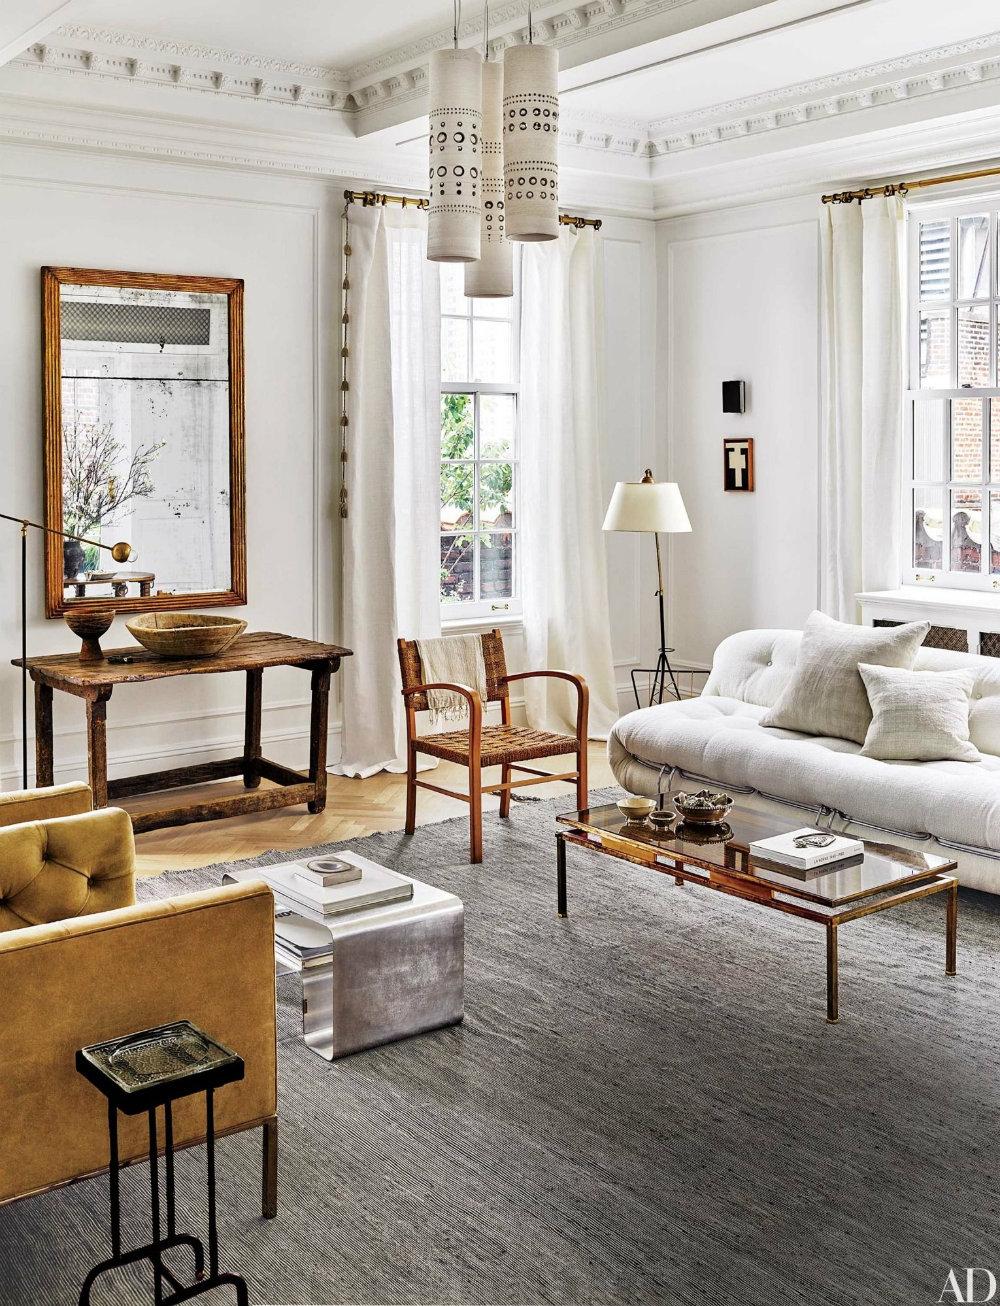 Living Room Design Ideas from Top Interior Designers 04 top interior designers Living Room Design Ideas from Top Interior Designers Living Room Design Ideas from Top Interior Designers 04